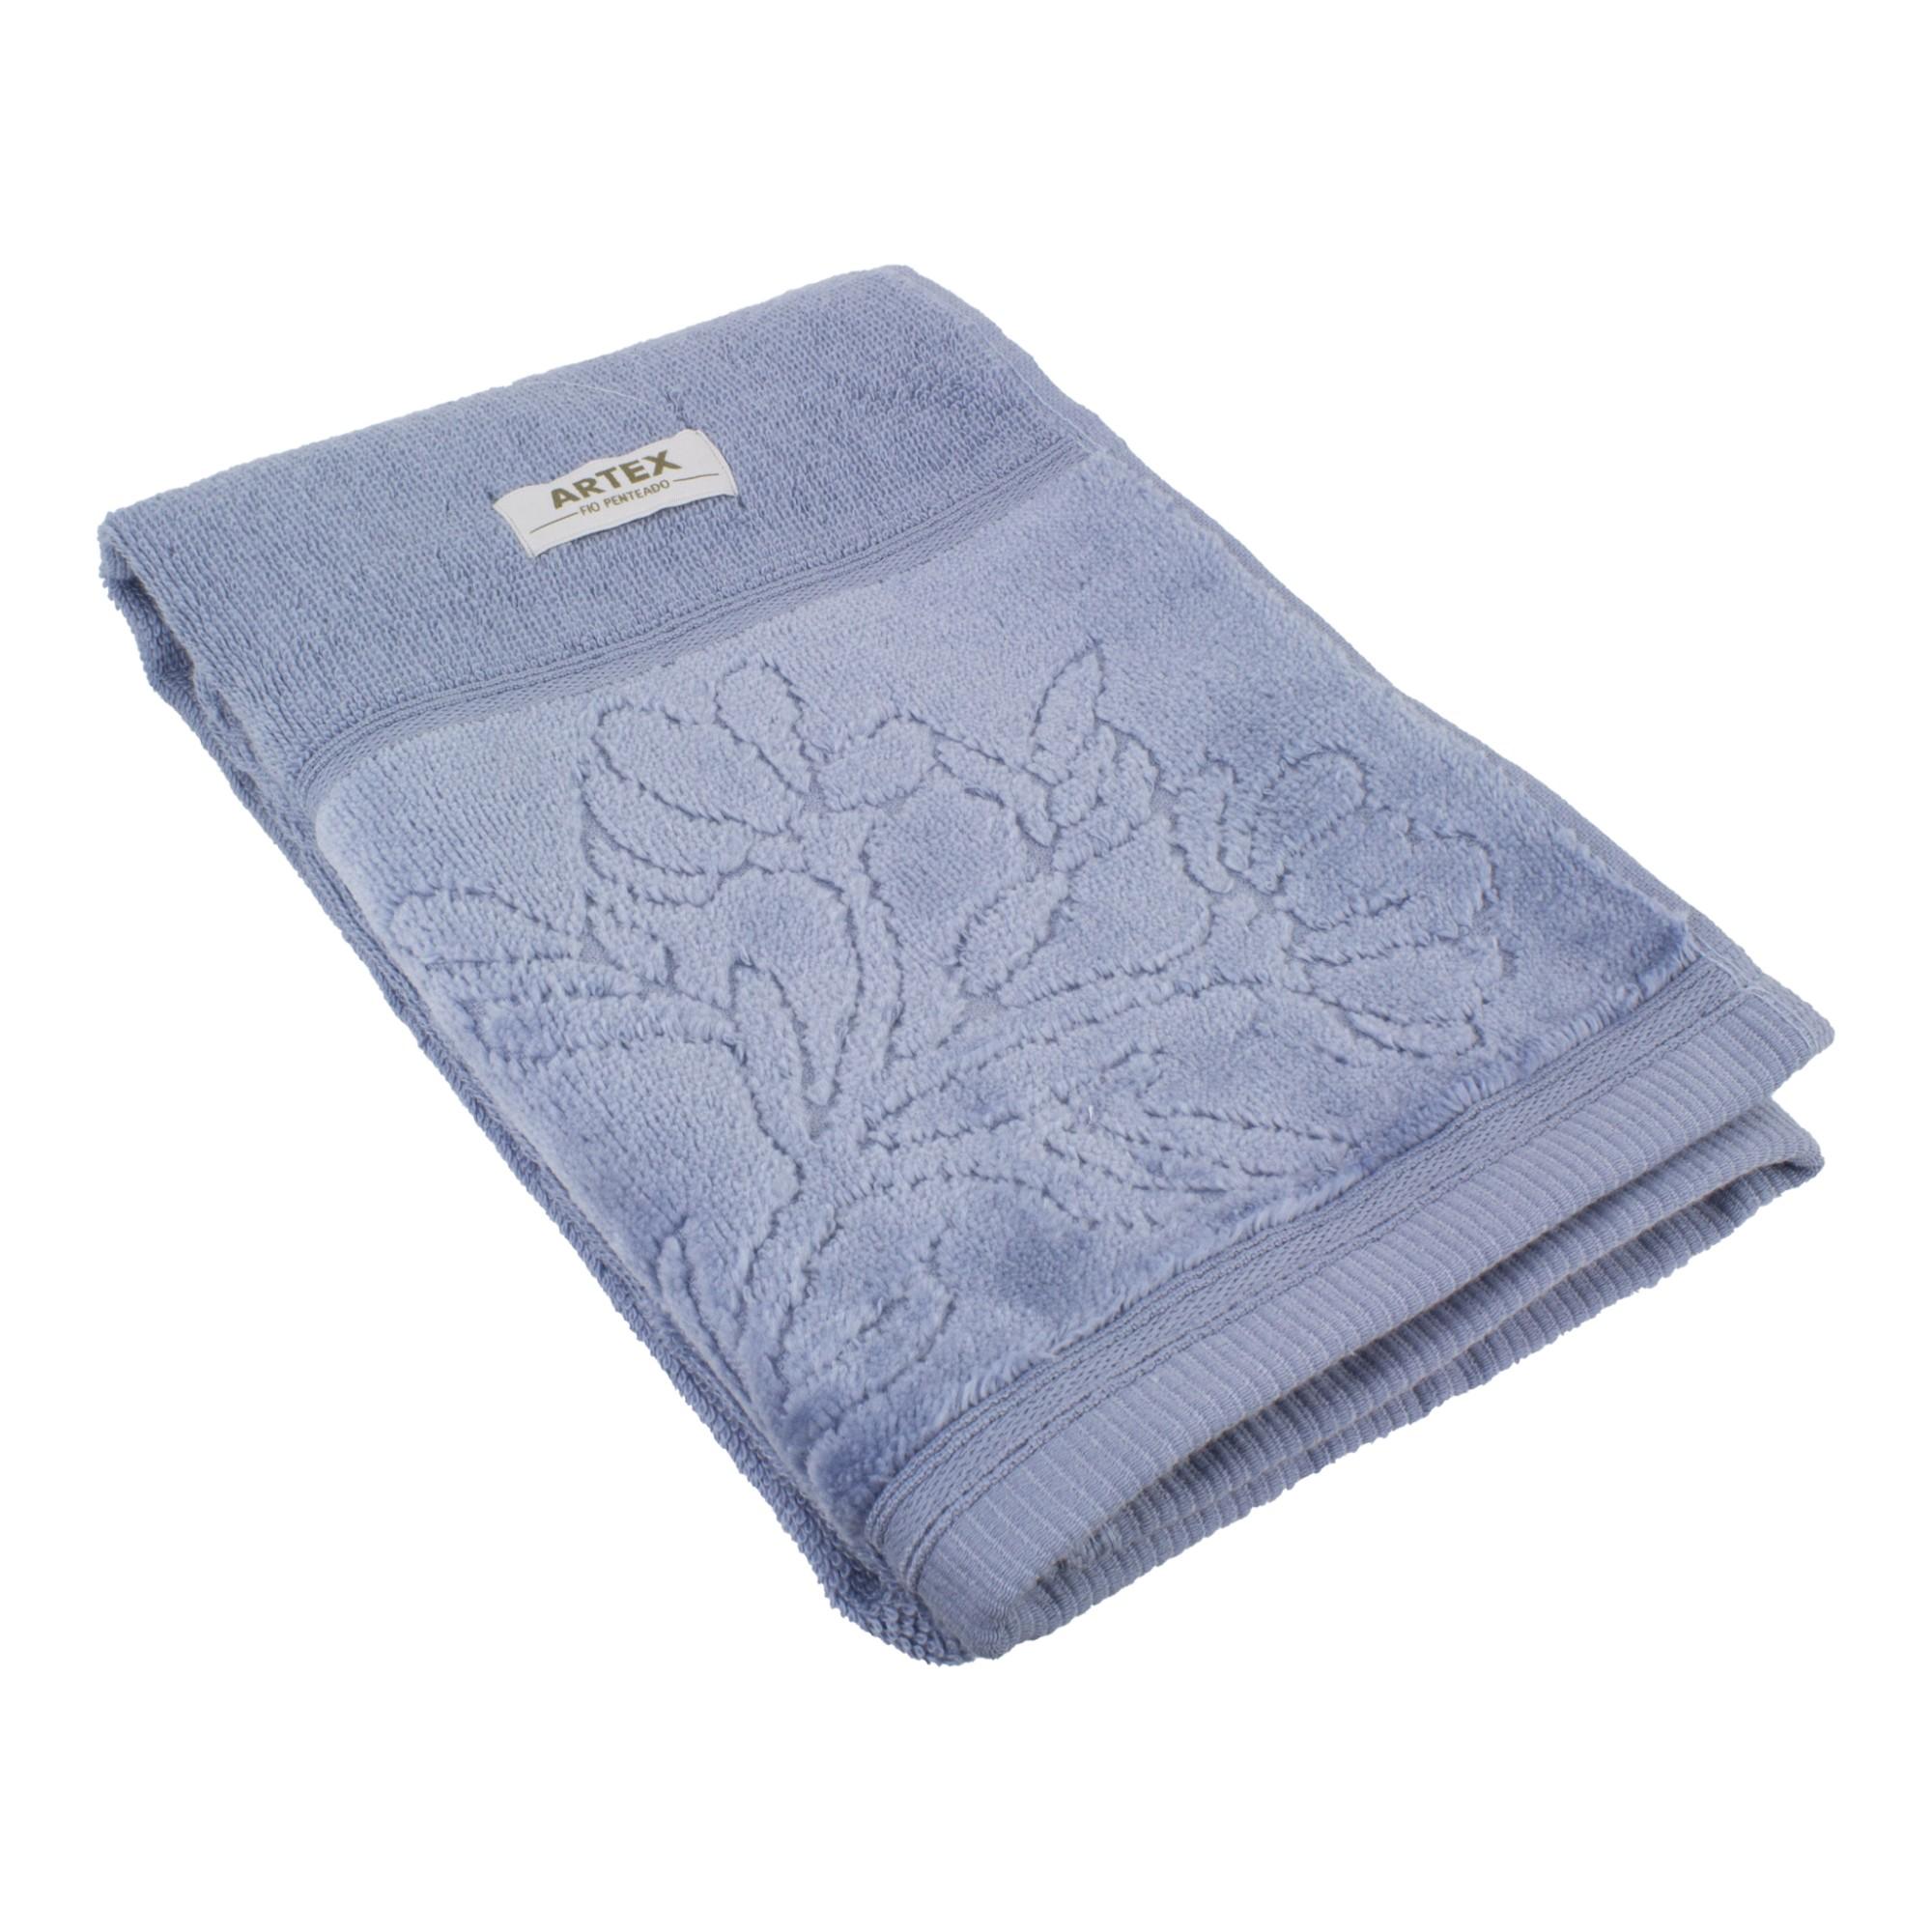 Toalha de Rosto Artex Le Bain 100 Algodao 50x80 cm Azul Denin